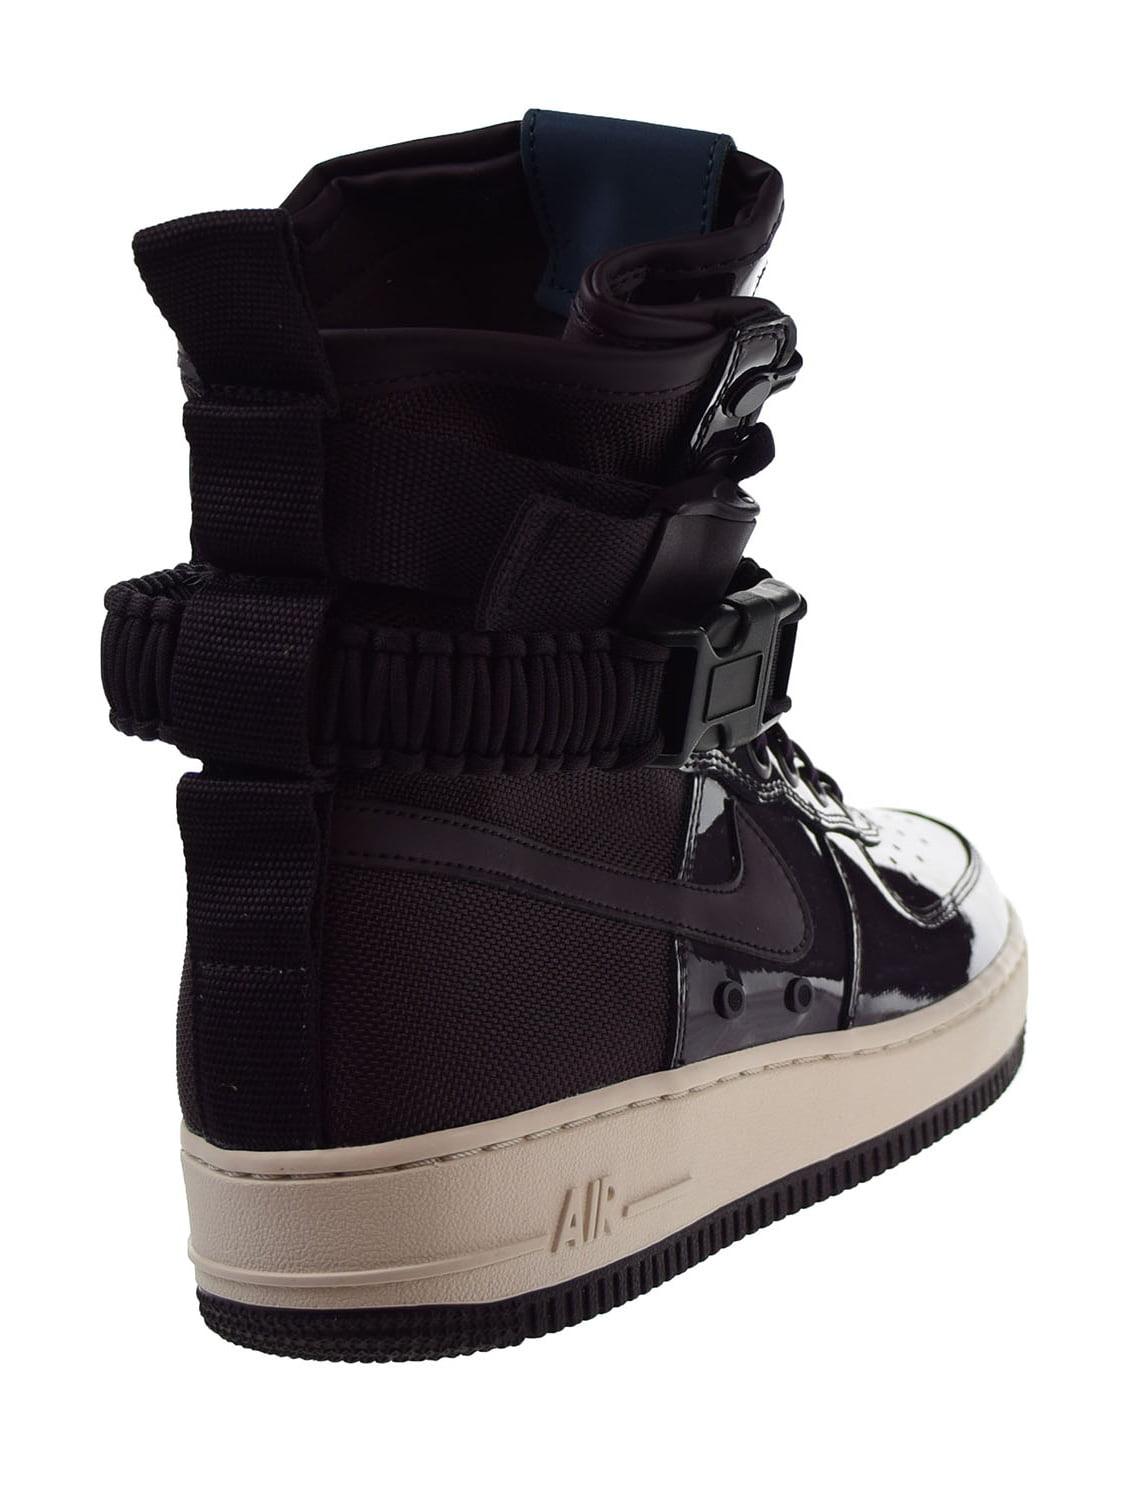 Nike SF Air Force 1 SE Premium Womens Shoes Port Wine/Space Blue aj0963-600